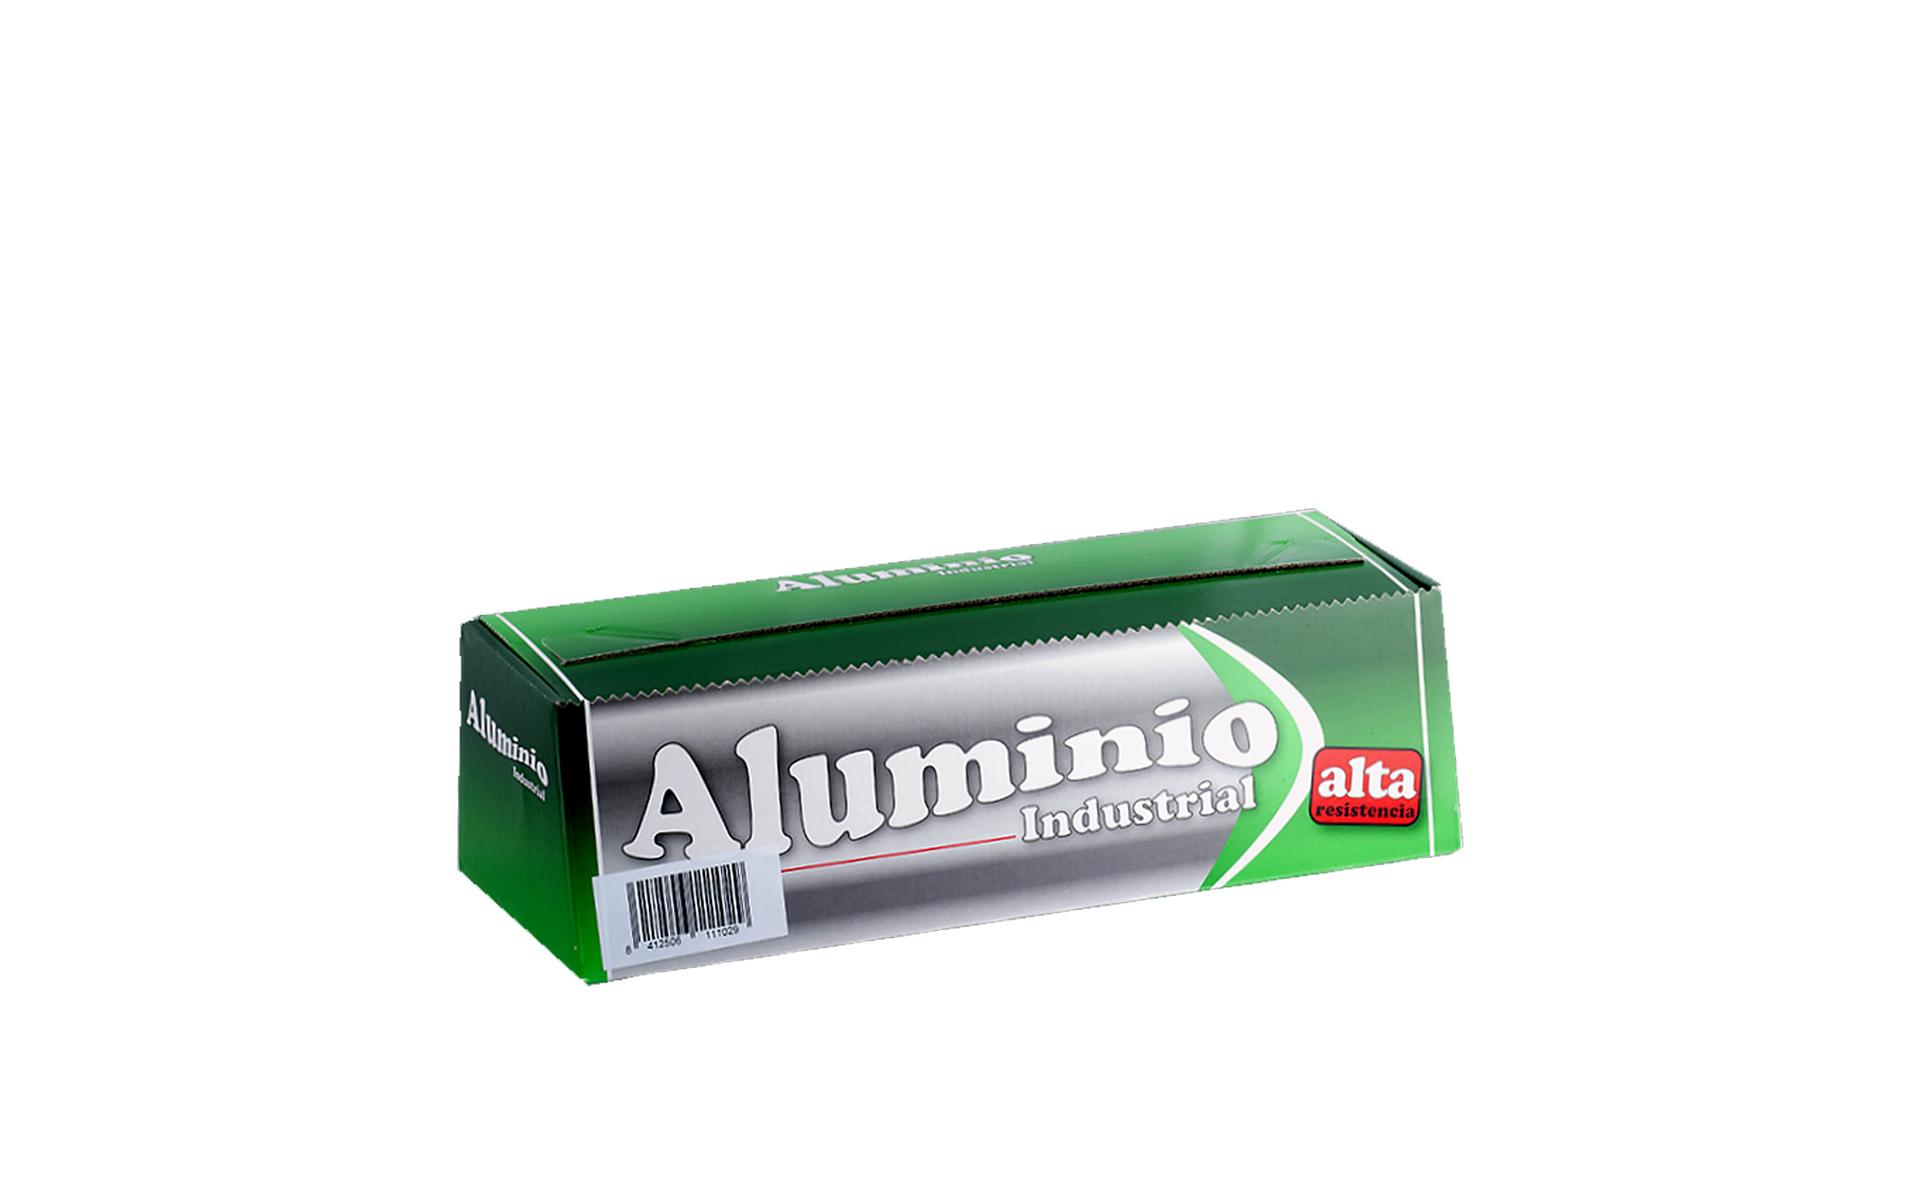 Rollo de Aluminio Industrial 290 mm.